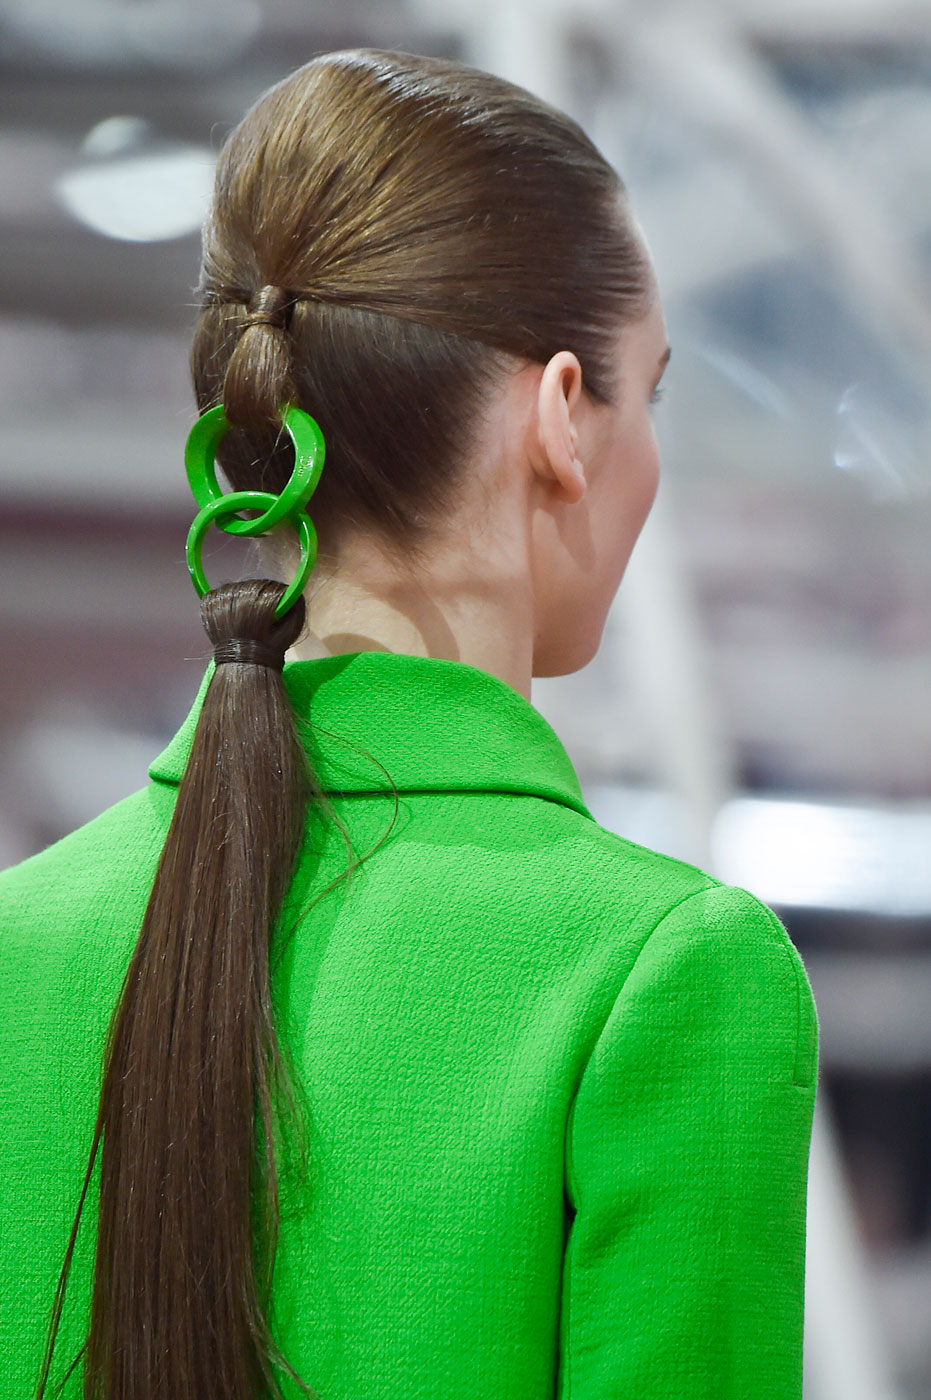 Christian-Dior-fashion-runway-show-close-ups-haute-couture-paris-spring-summer-2015-the-impression-033